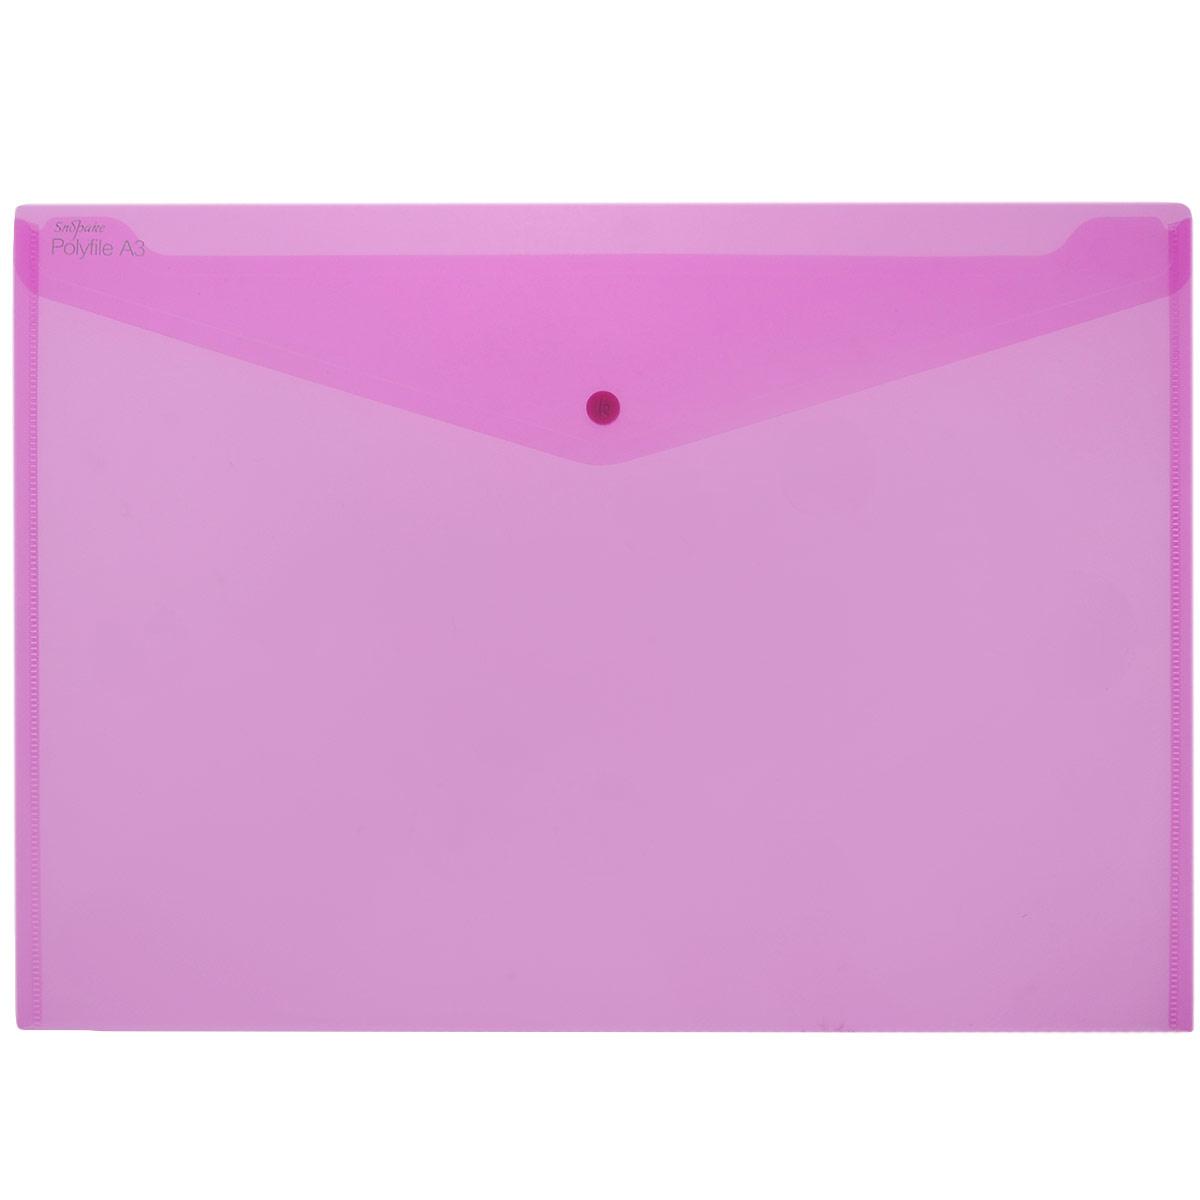 Папка-конверт на кнопке Snopake Polifile: Electra, цвет: розовый, формат А3K11185